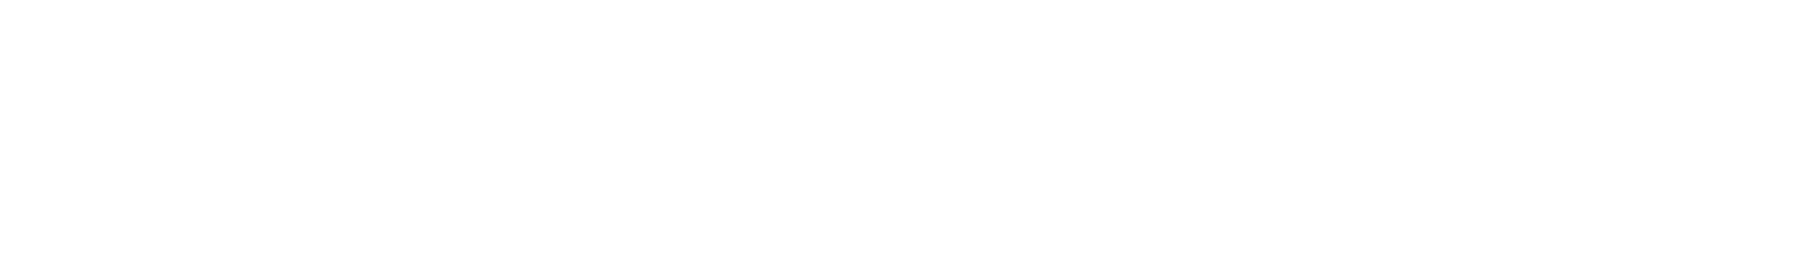 arab percussion loop 1